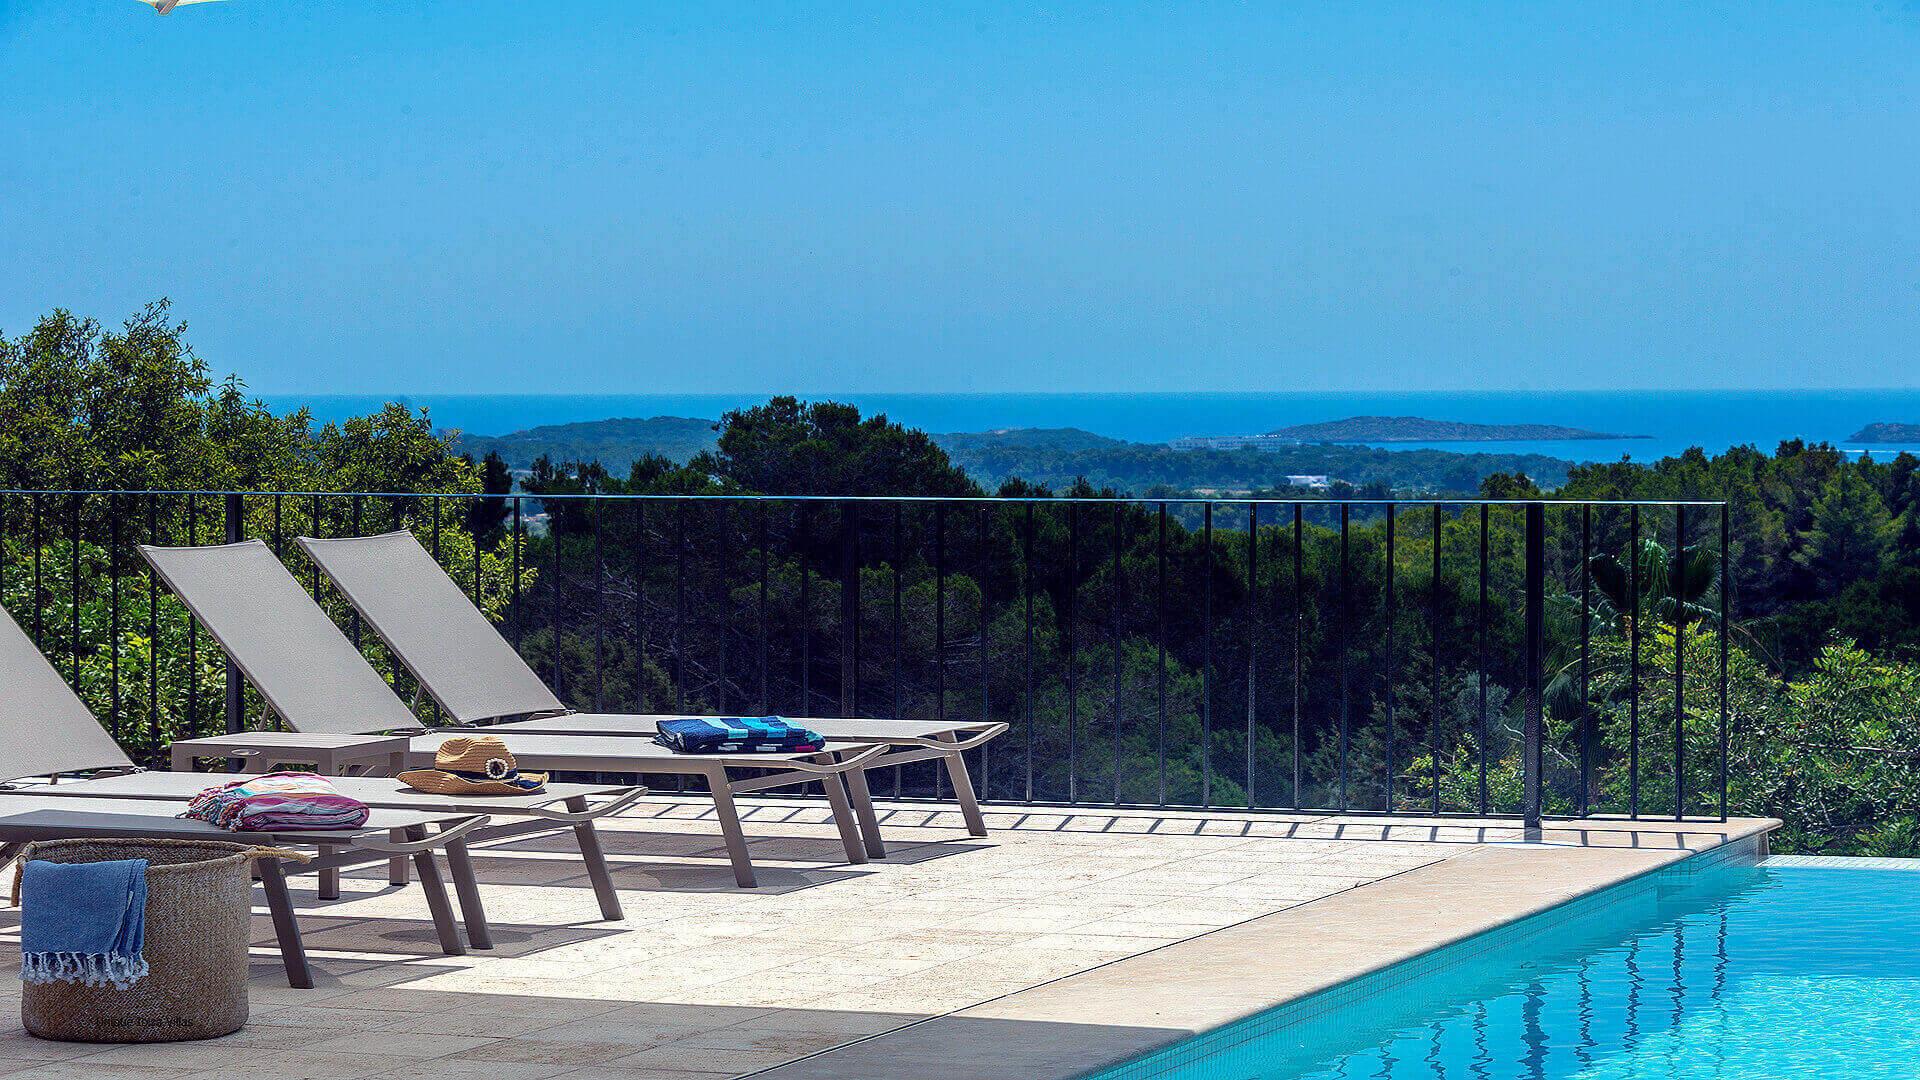 Casa Prats Ibiza 10 Santa Eulalia